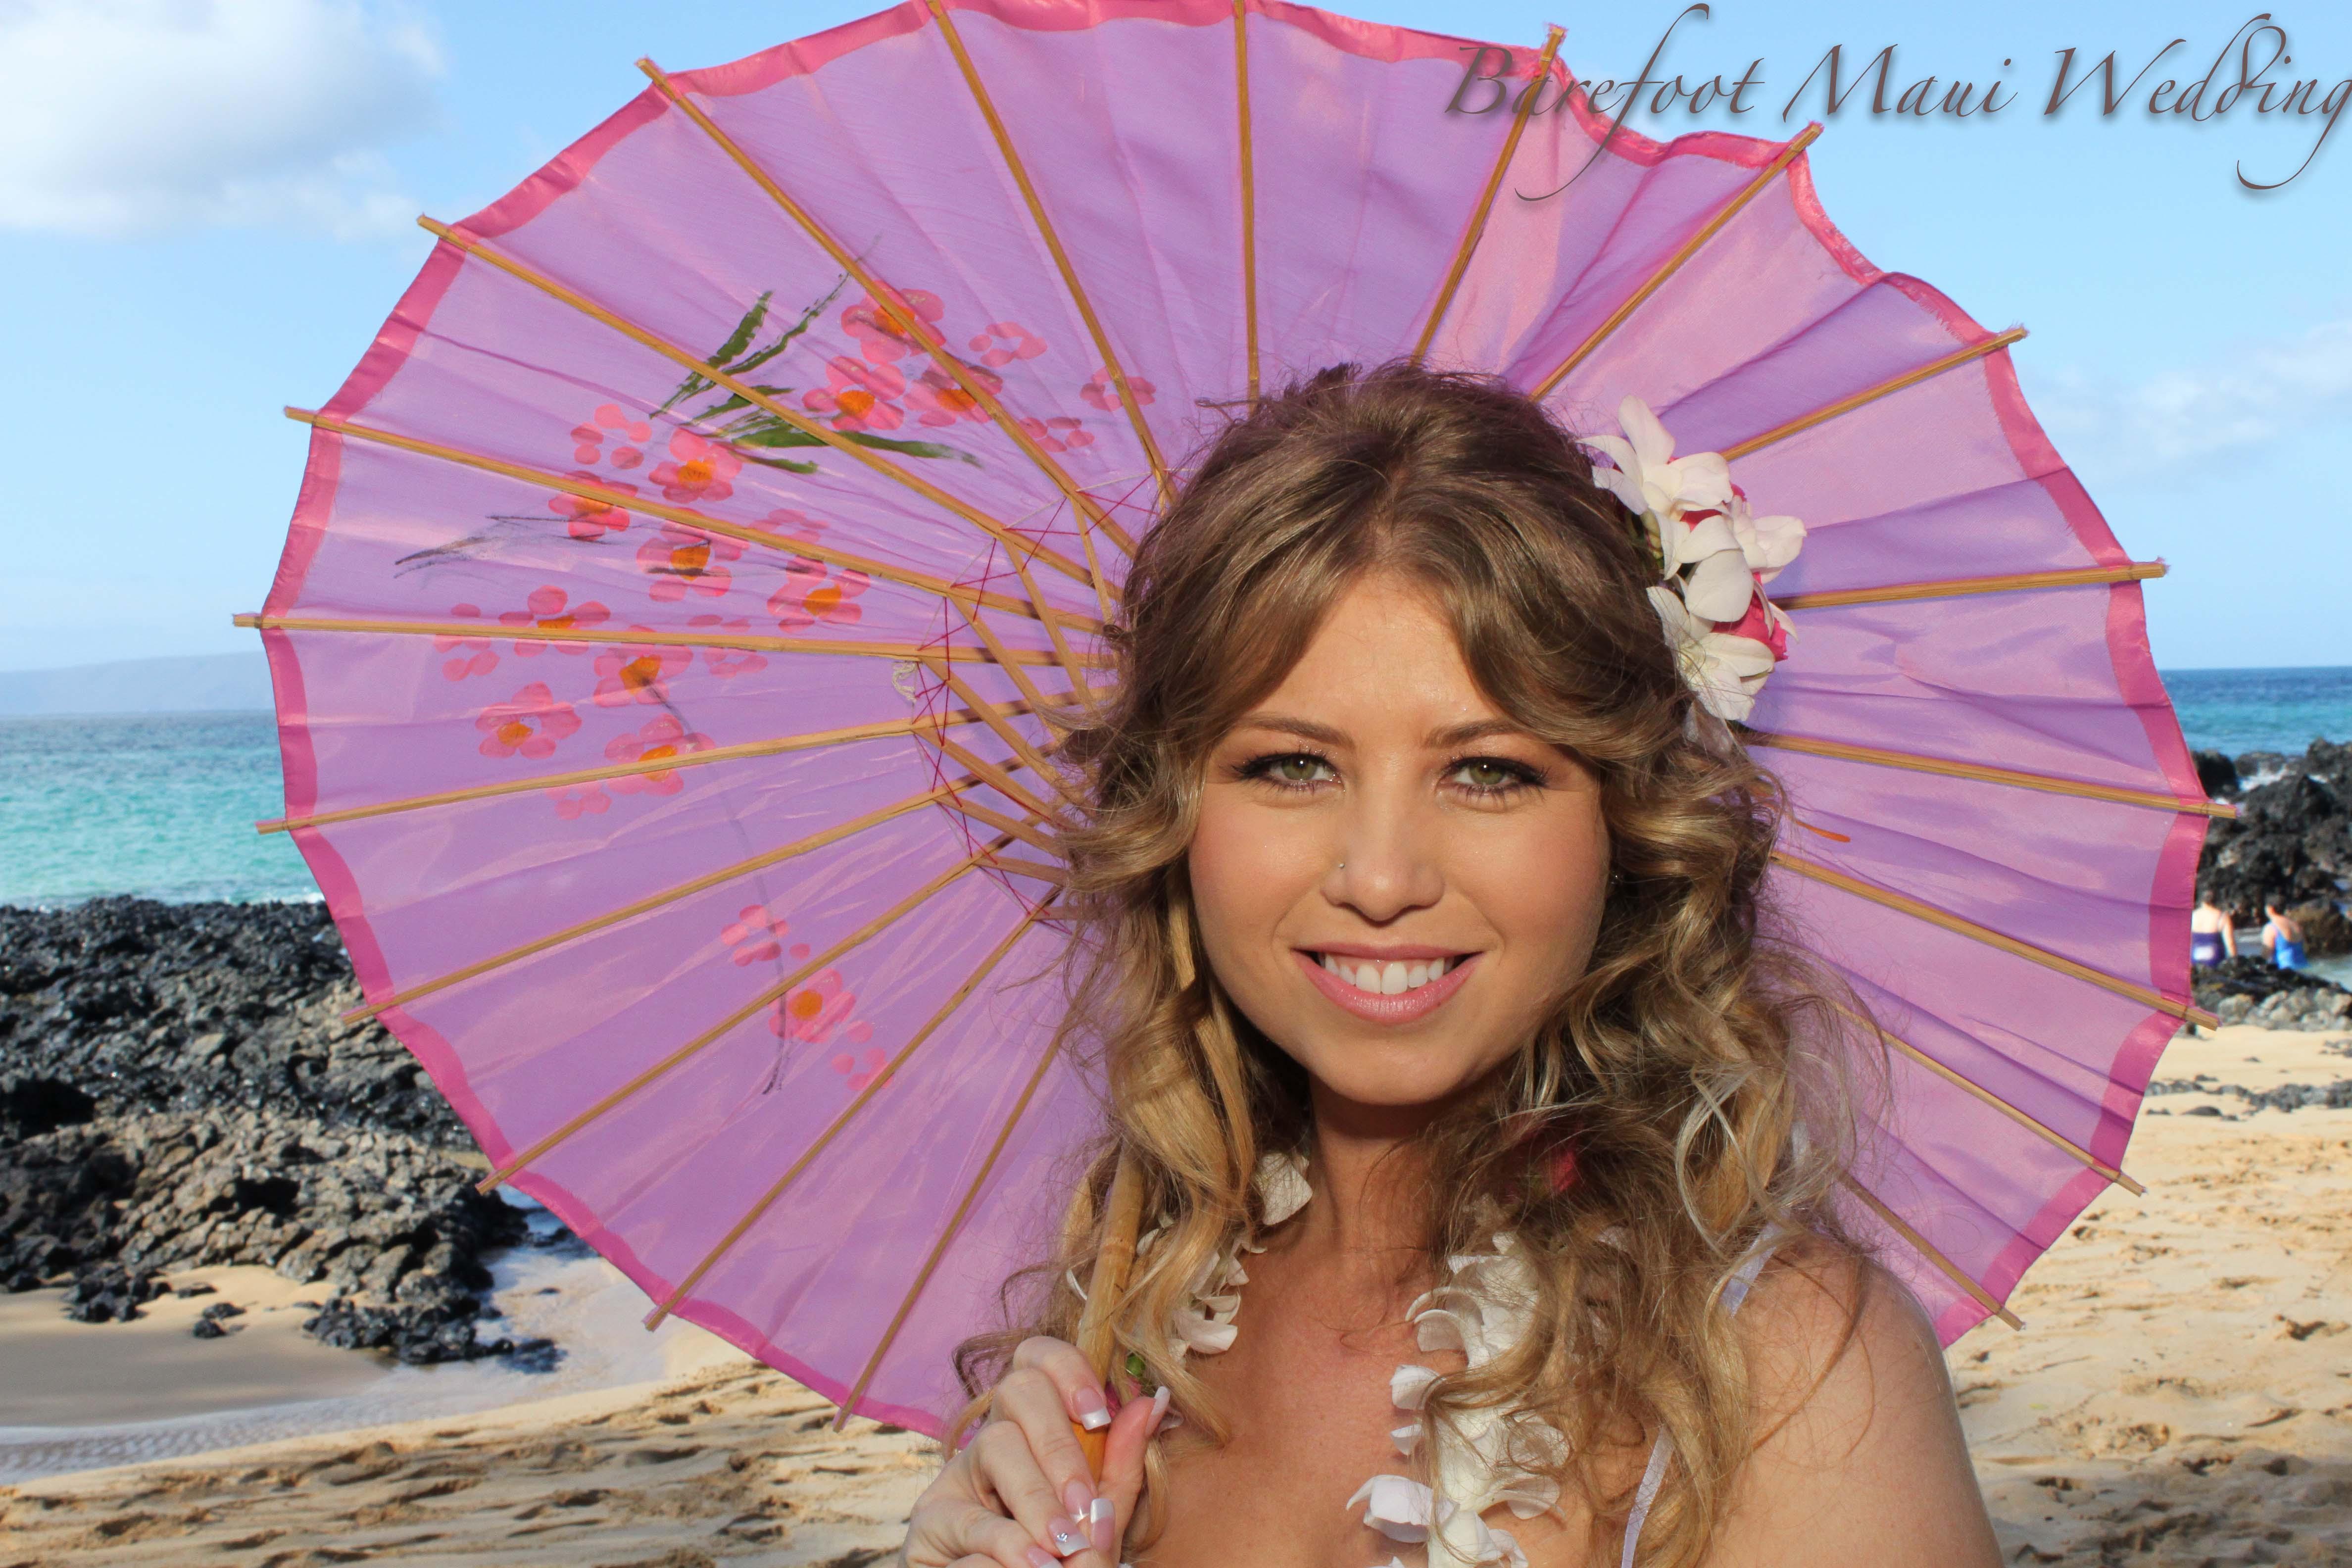 Barefoot Maui Wedding Fun PHotography-11